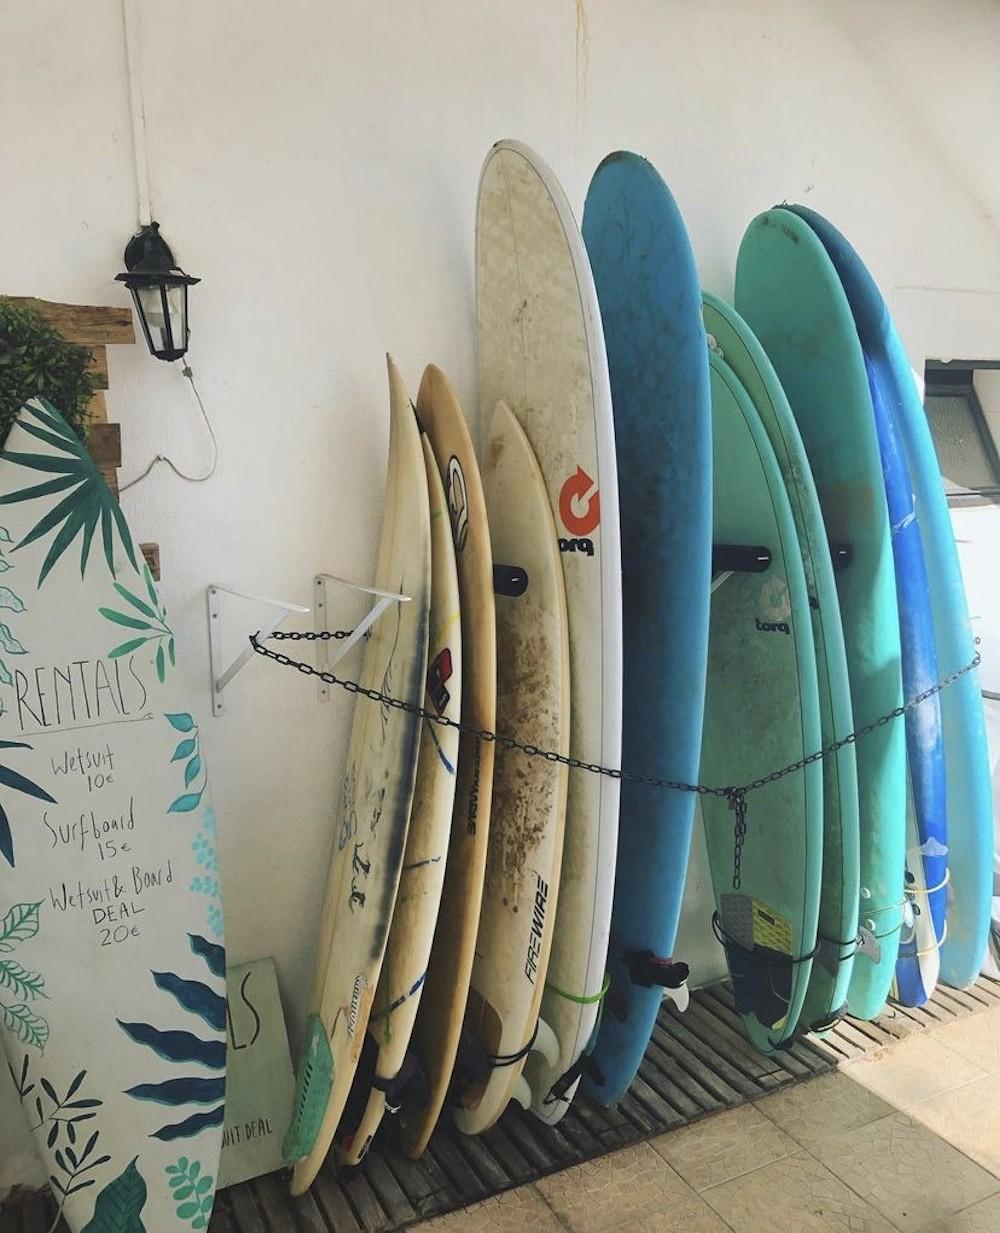 Surfplanken in Portugal